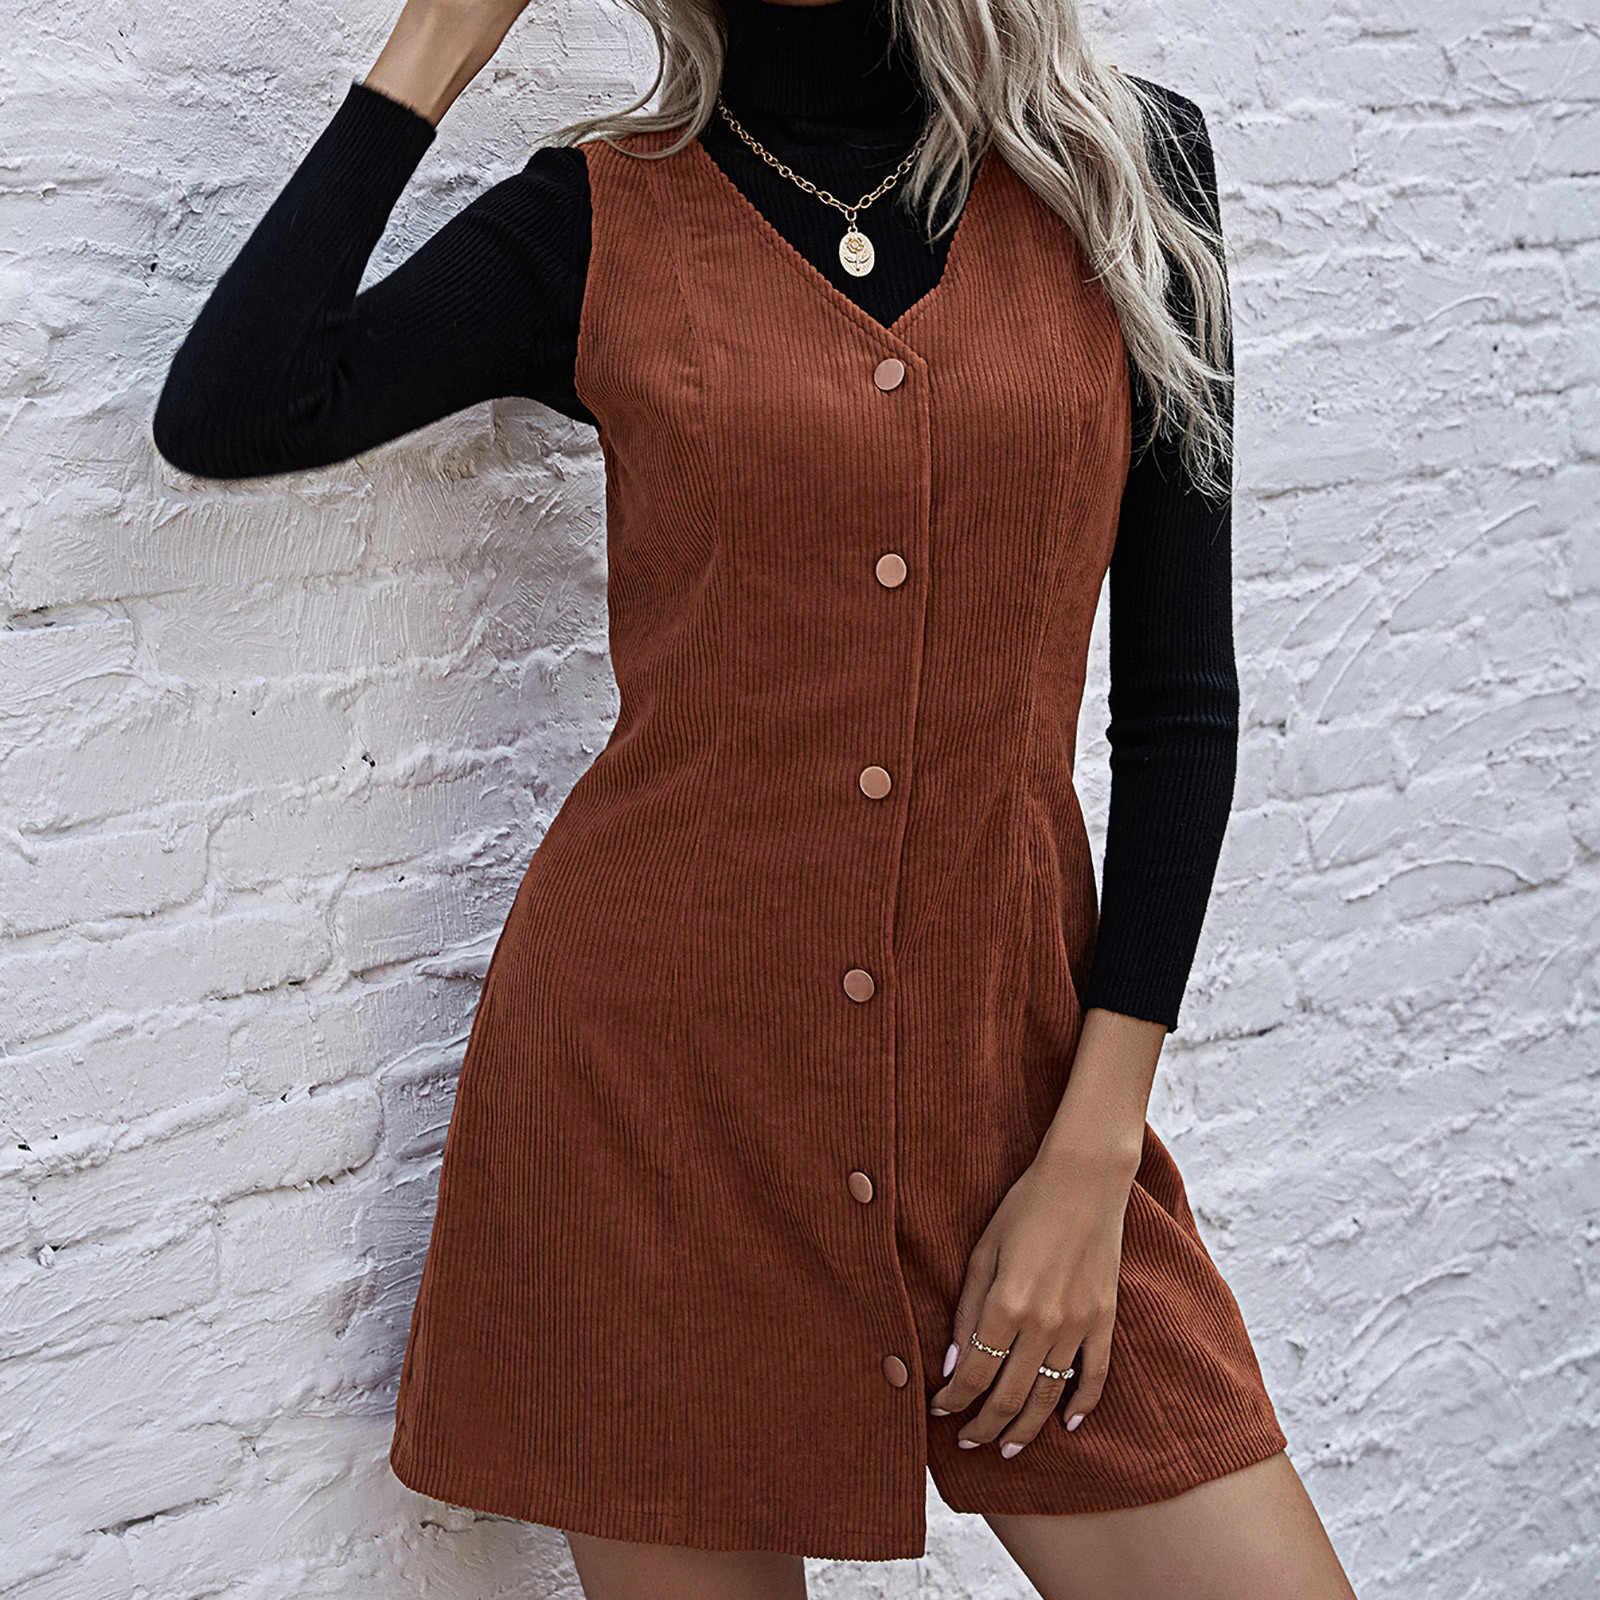 2021 Baru Solid Gaun Wanita Tank Gaun Musim Gugur dan Musim Dingin Temperamen Leher V Korduroi Gaun Tanpa Lengan Tombol Fashion Vestidos